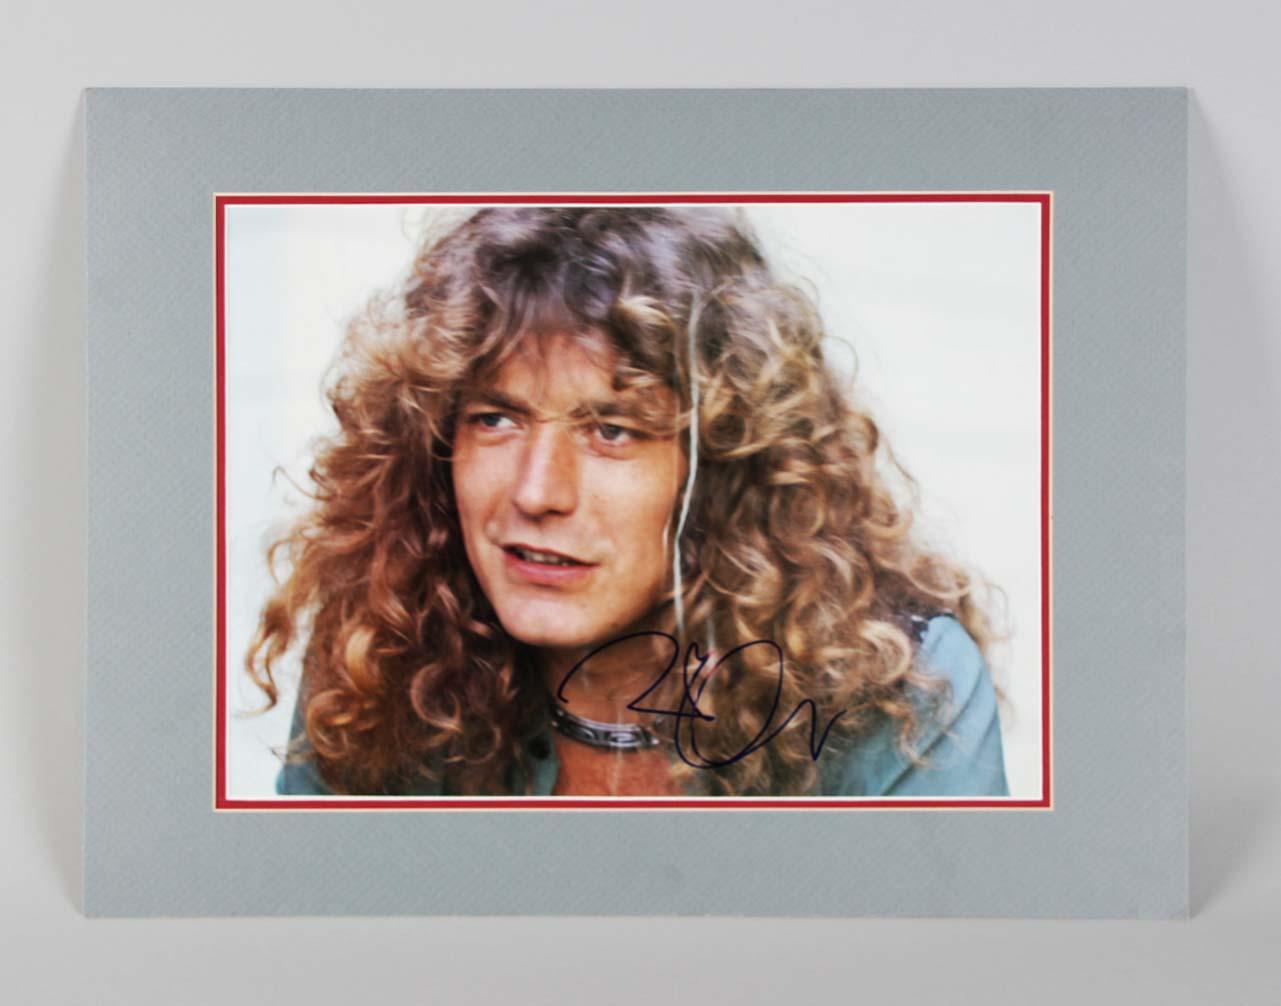 Robert Plant Signed Photo Matted Display Led Zeppelin - COA JSA